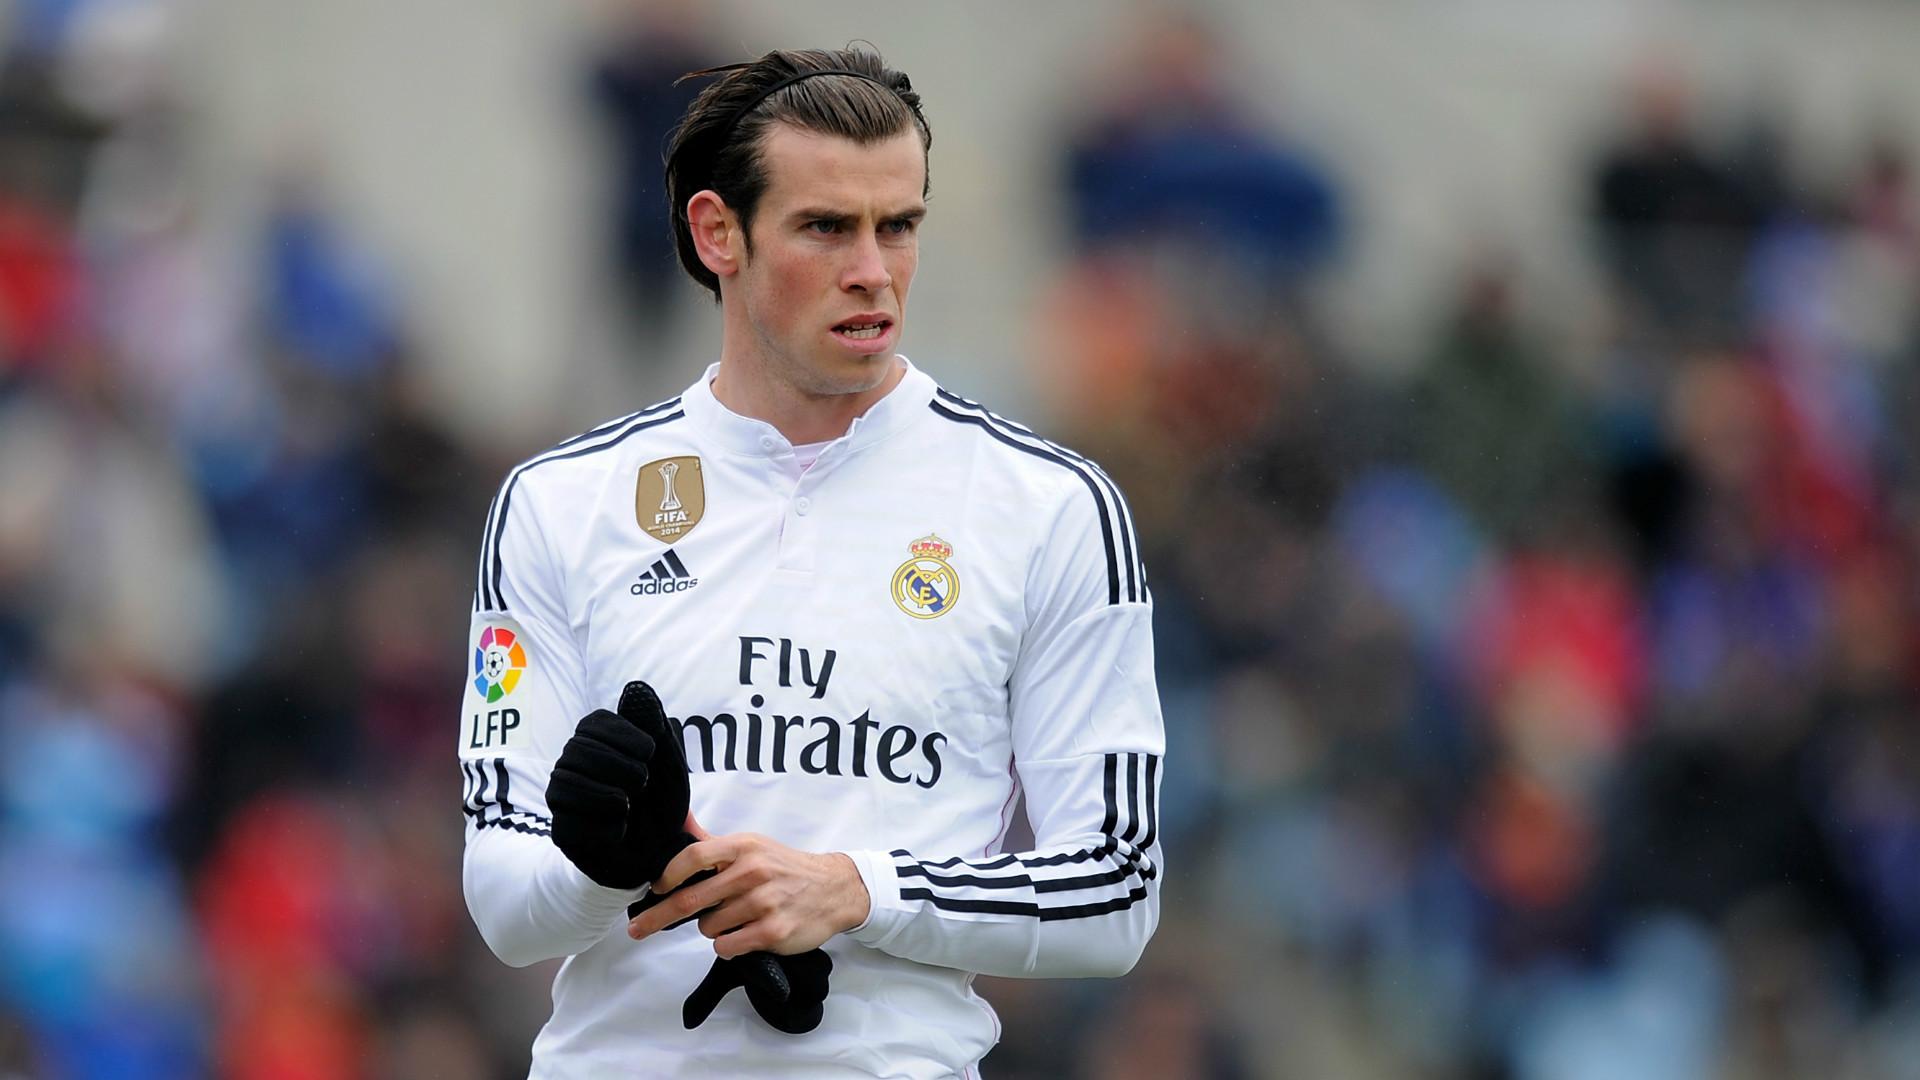 Ronaldo Hd Wallpapers Football Gareth Bale Wallpaper 2018 Hd 79 Images